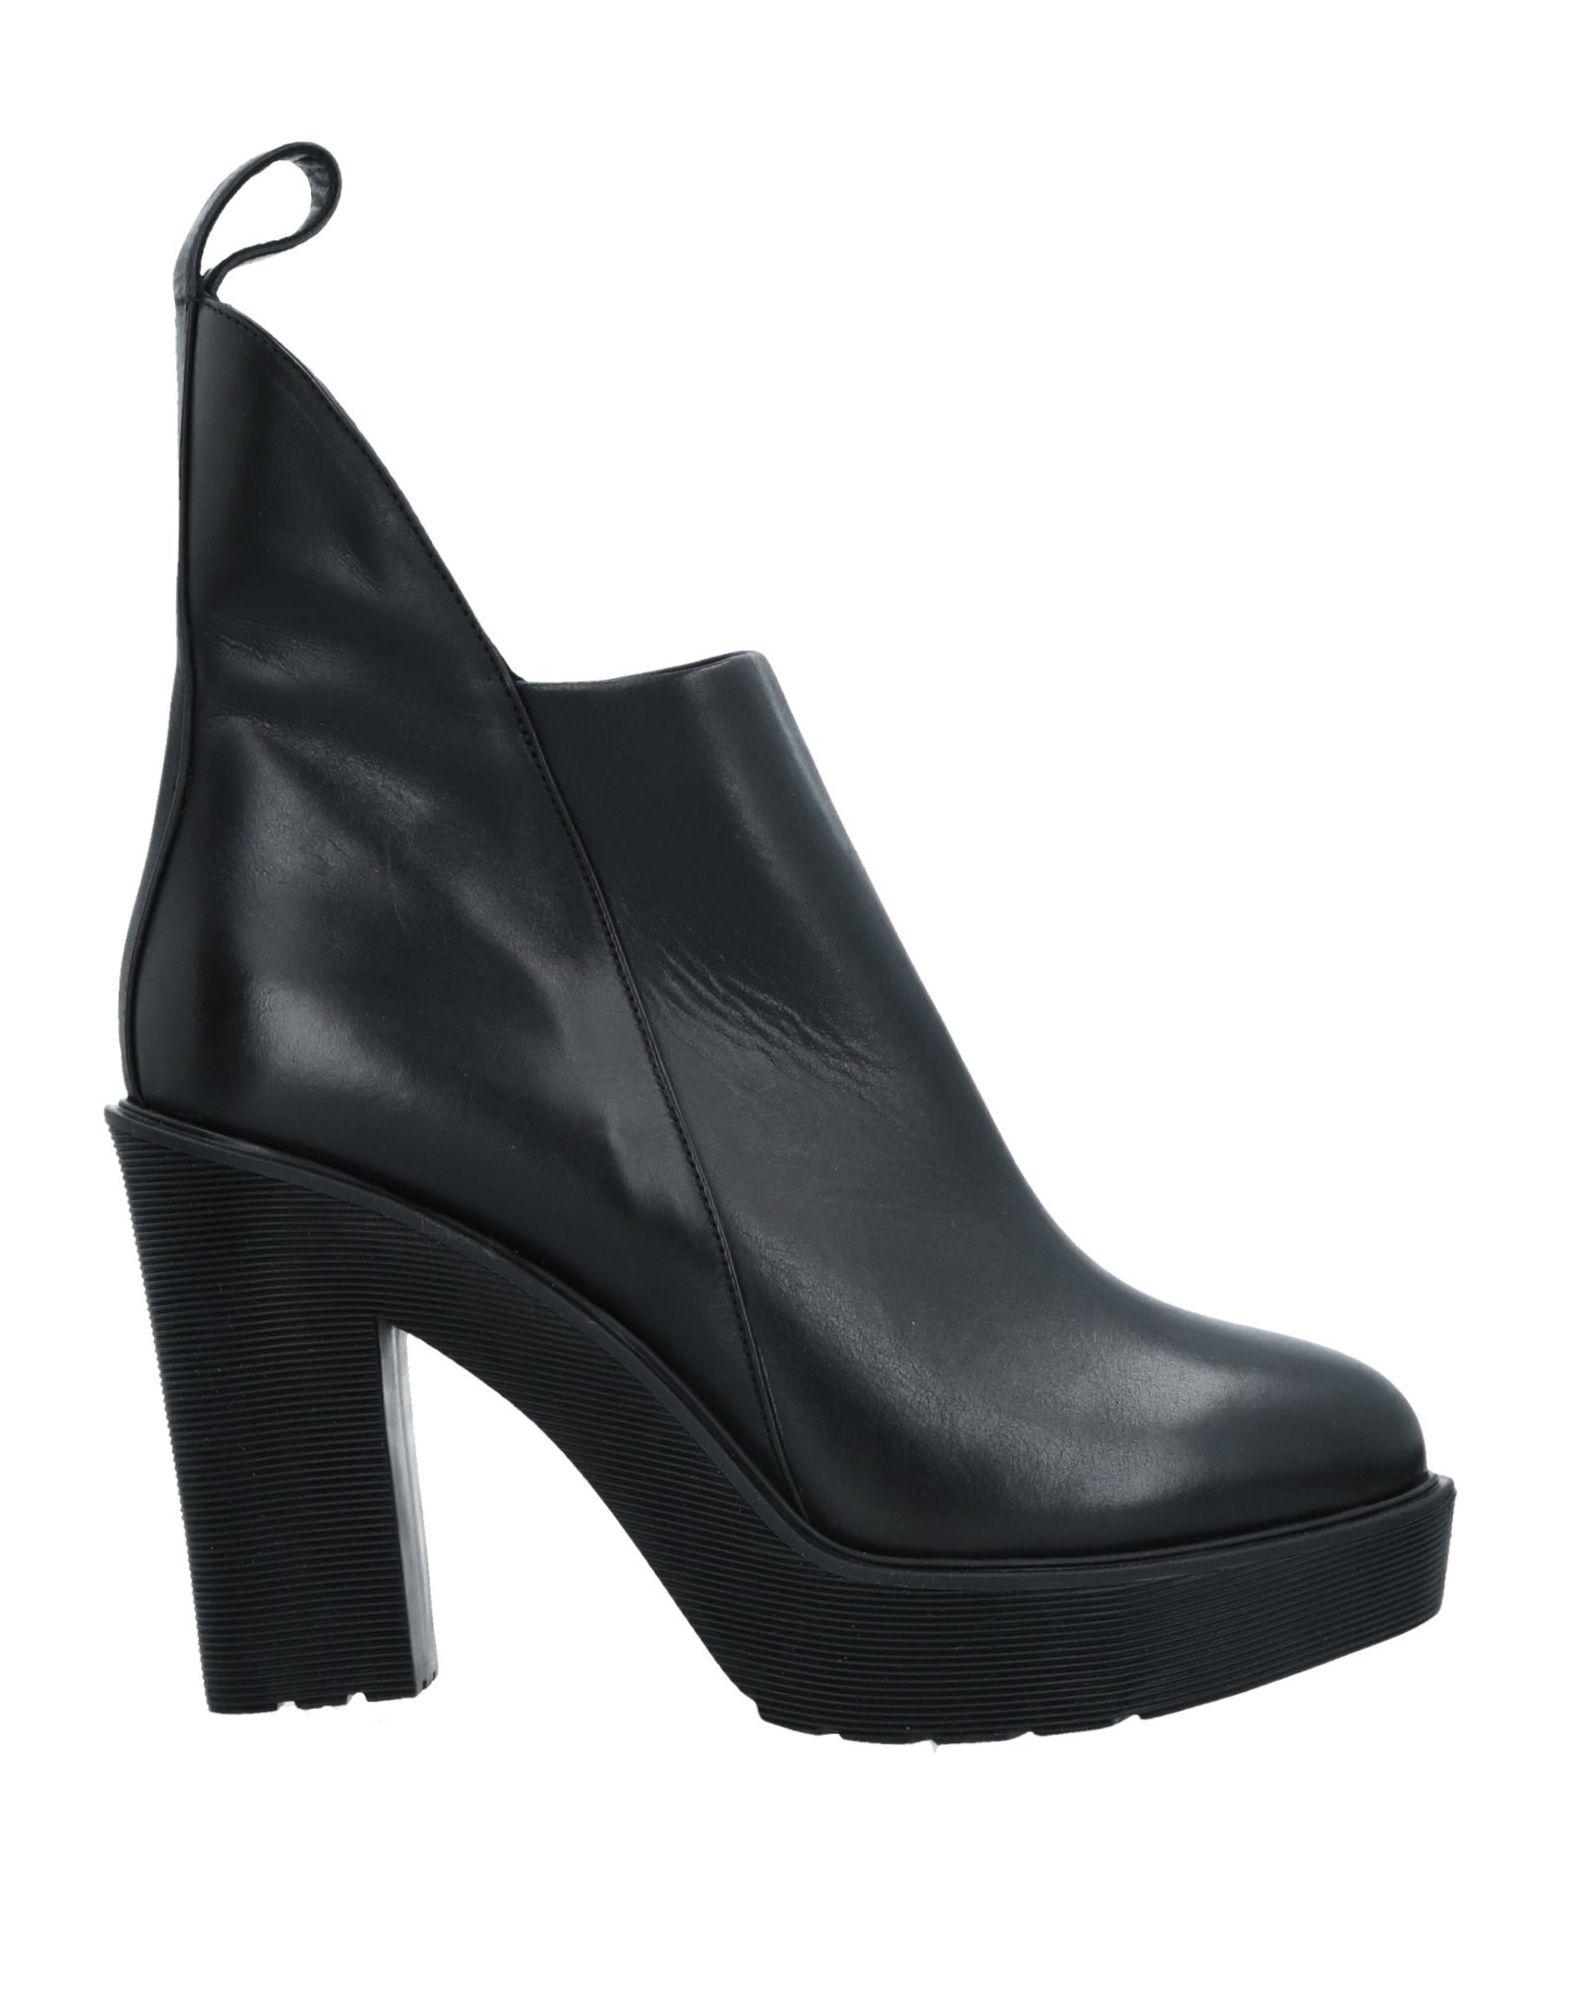 Stilvolle billige Stiefelette Schuhe Max Bianco Stiefelette billige Damen  11520142FA c214fb